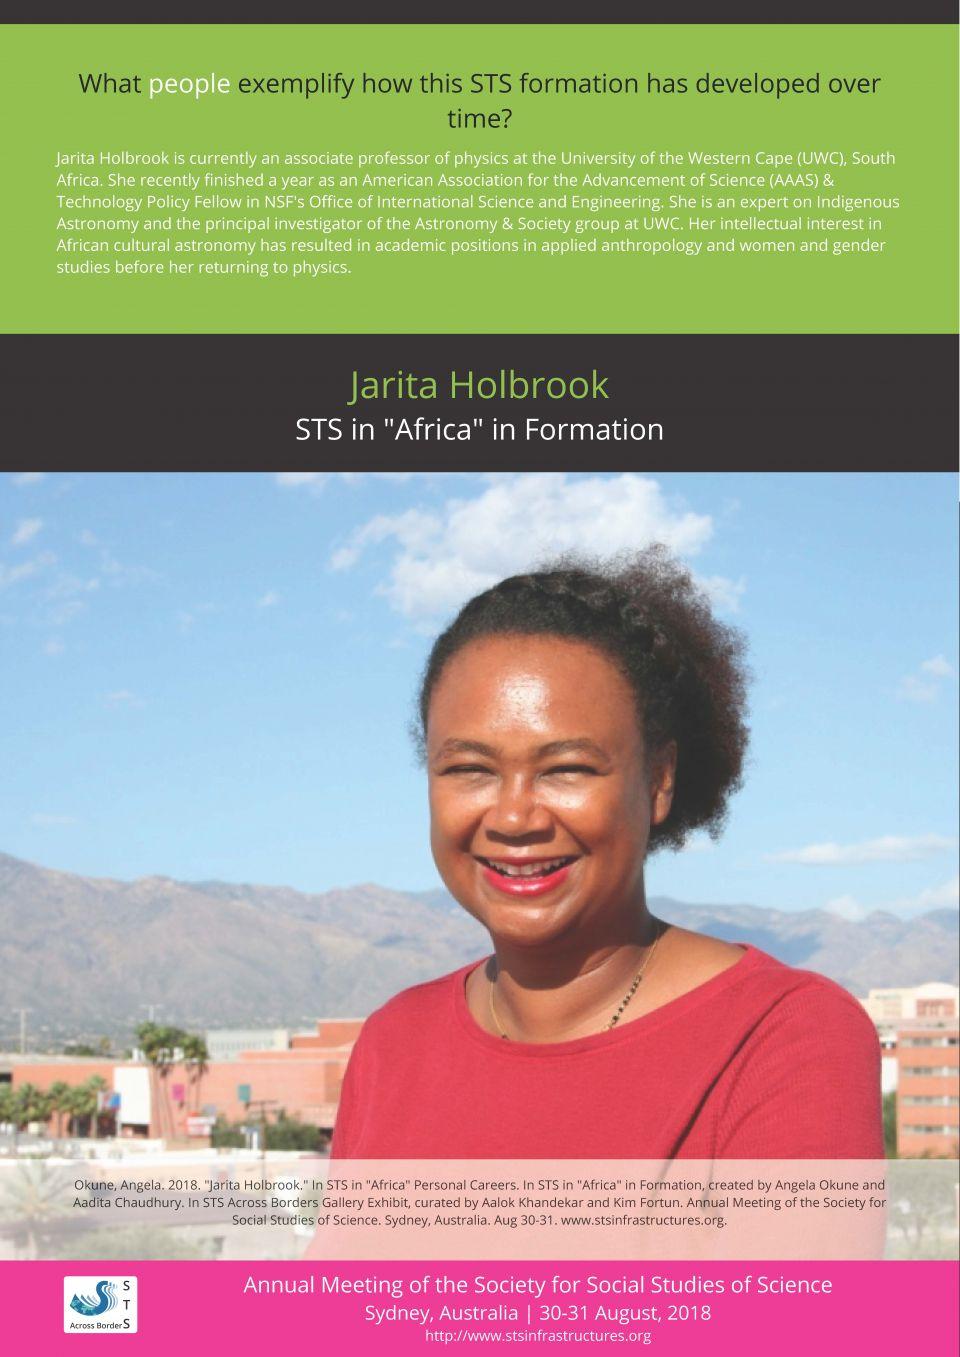 Jarita Holbrook